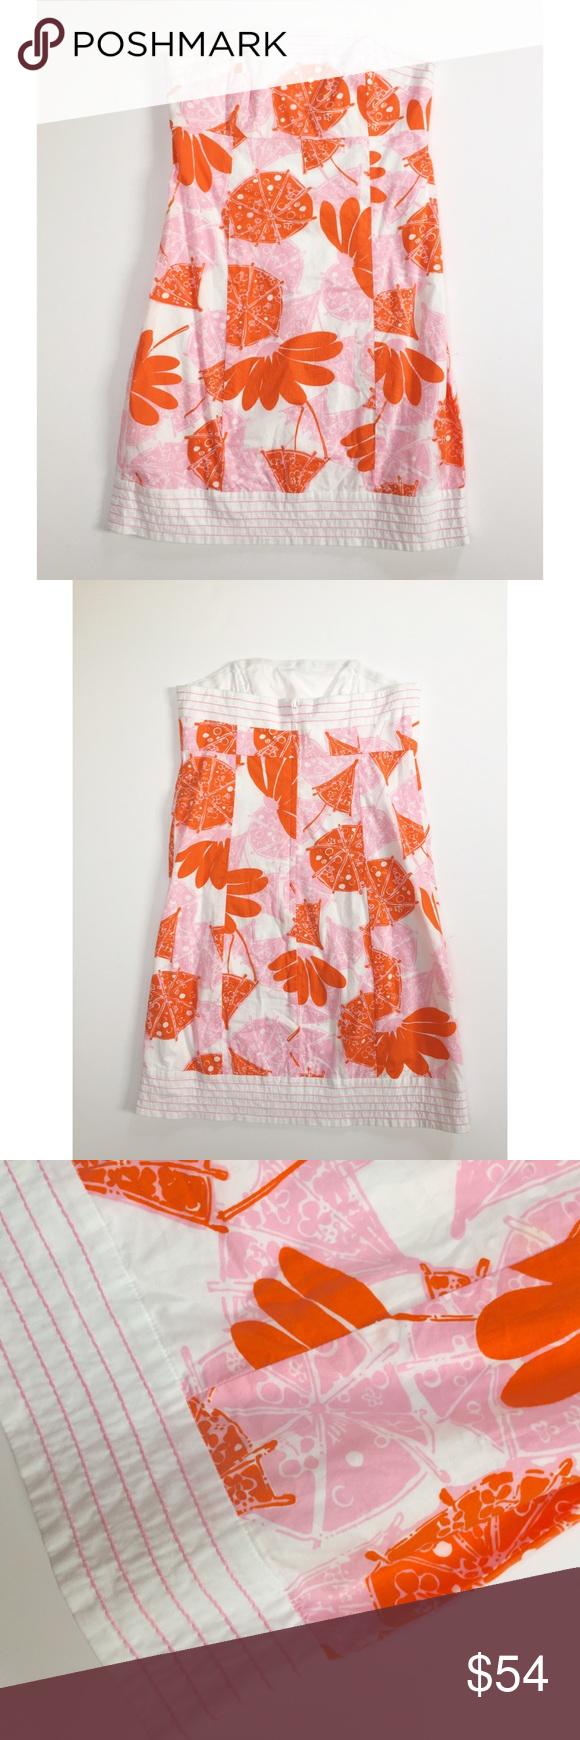 Lilly Pulitzer Citrus Print Strapless Dress Lilly Pulitzer strapless ...